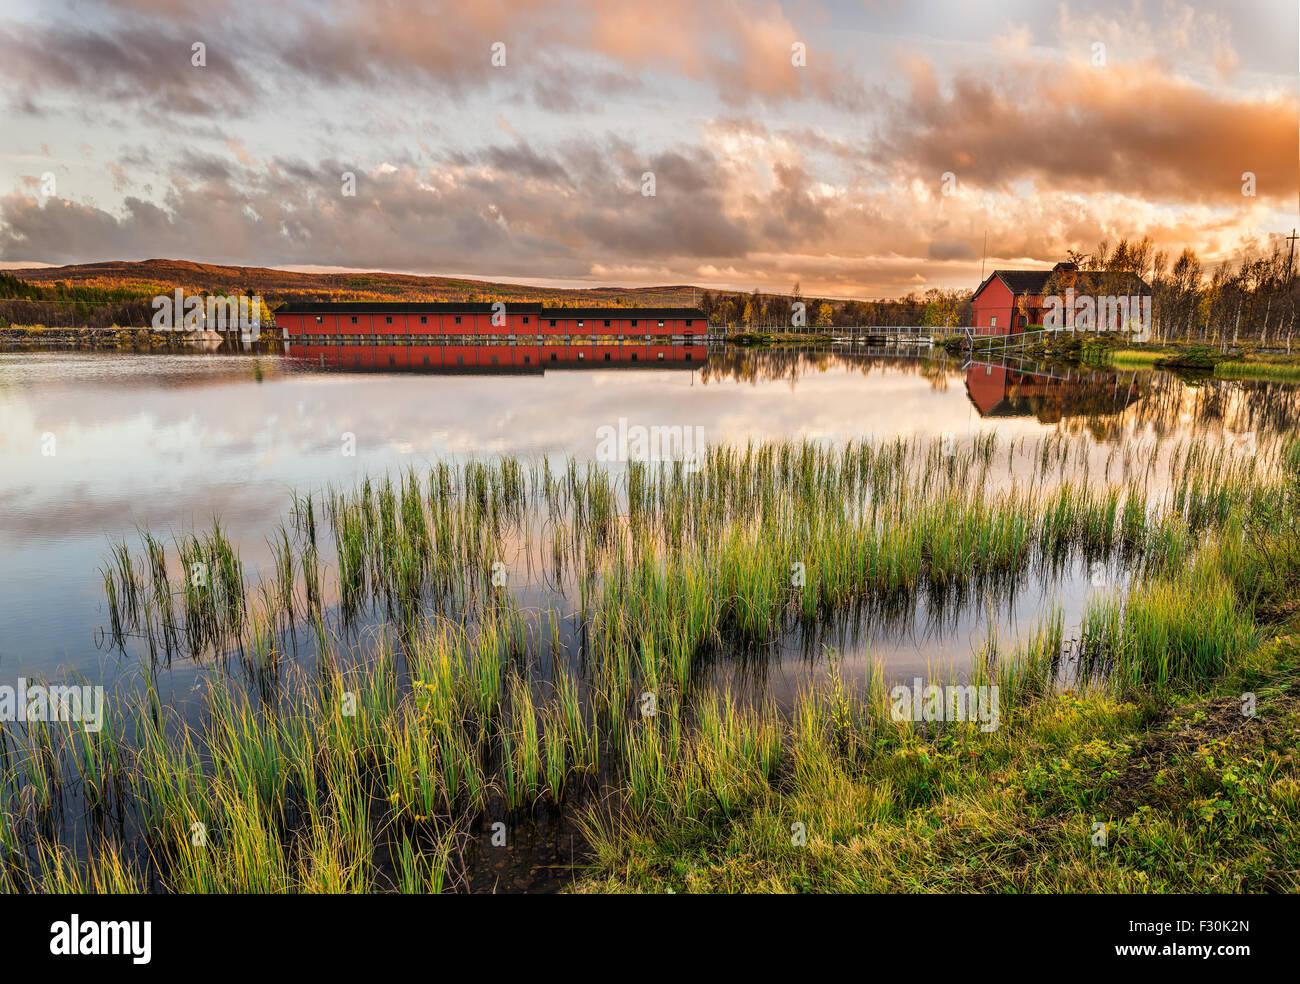 Kultige Holzbrücke am Narsjoen See in Hedmark Grafschaft, Norwegen bei Sonnenuntergang Stockbild